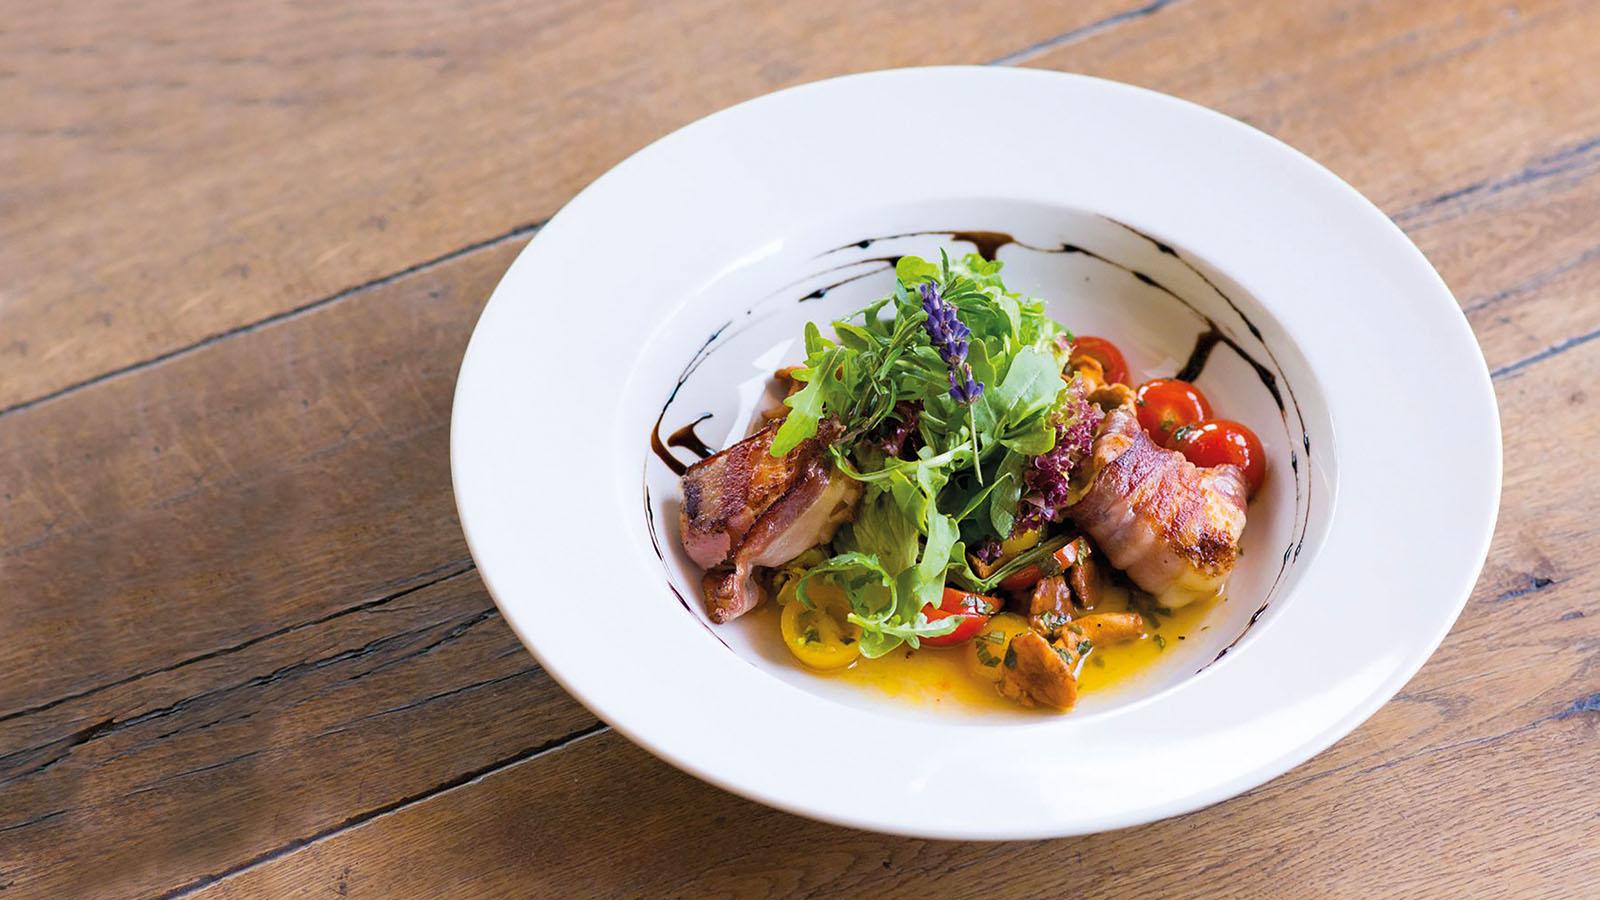 Gemischter Salat mit Ziegenkäse im Speckmantel - Penzinghof - Oberndorf in Tirol